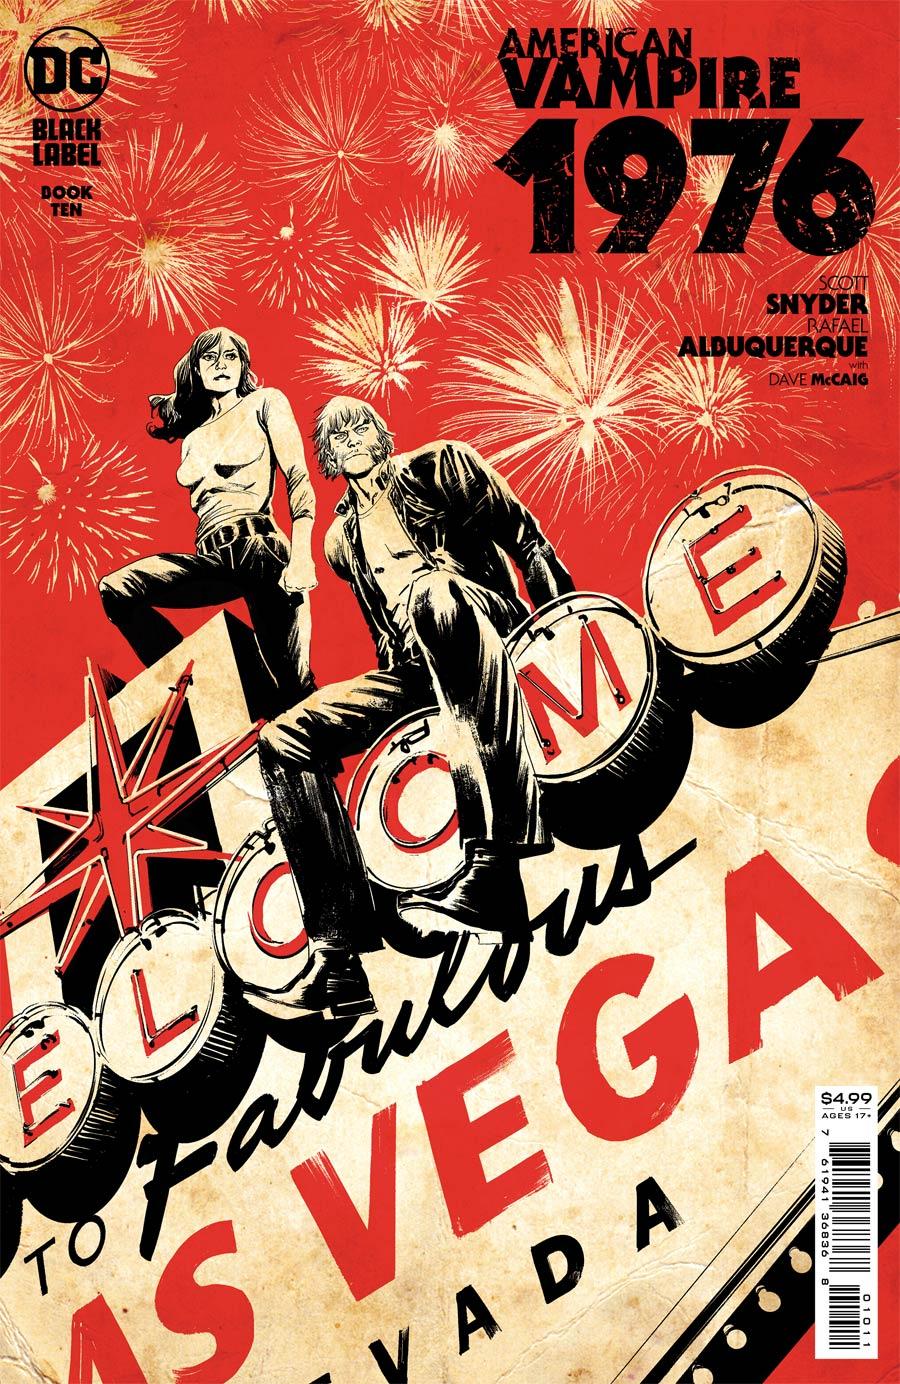 American Vampire 1976 #10 Cover A Regular Rafael Albuquerque Cover